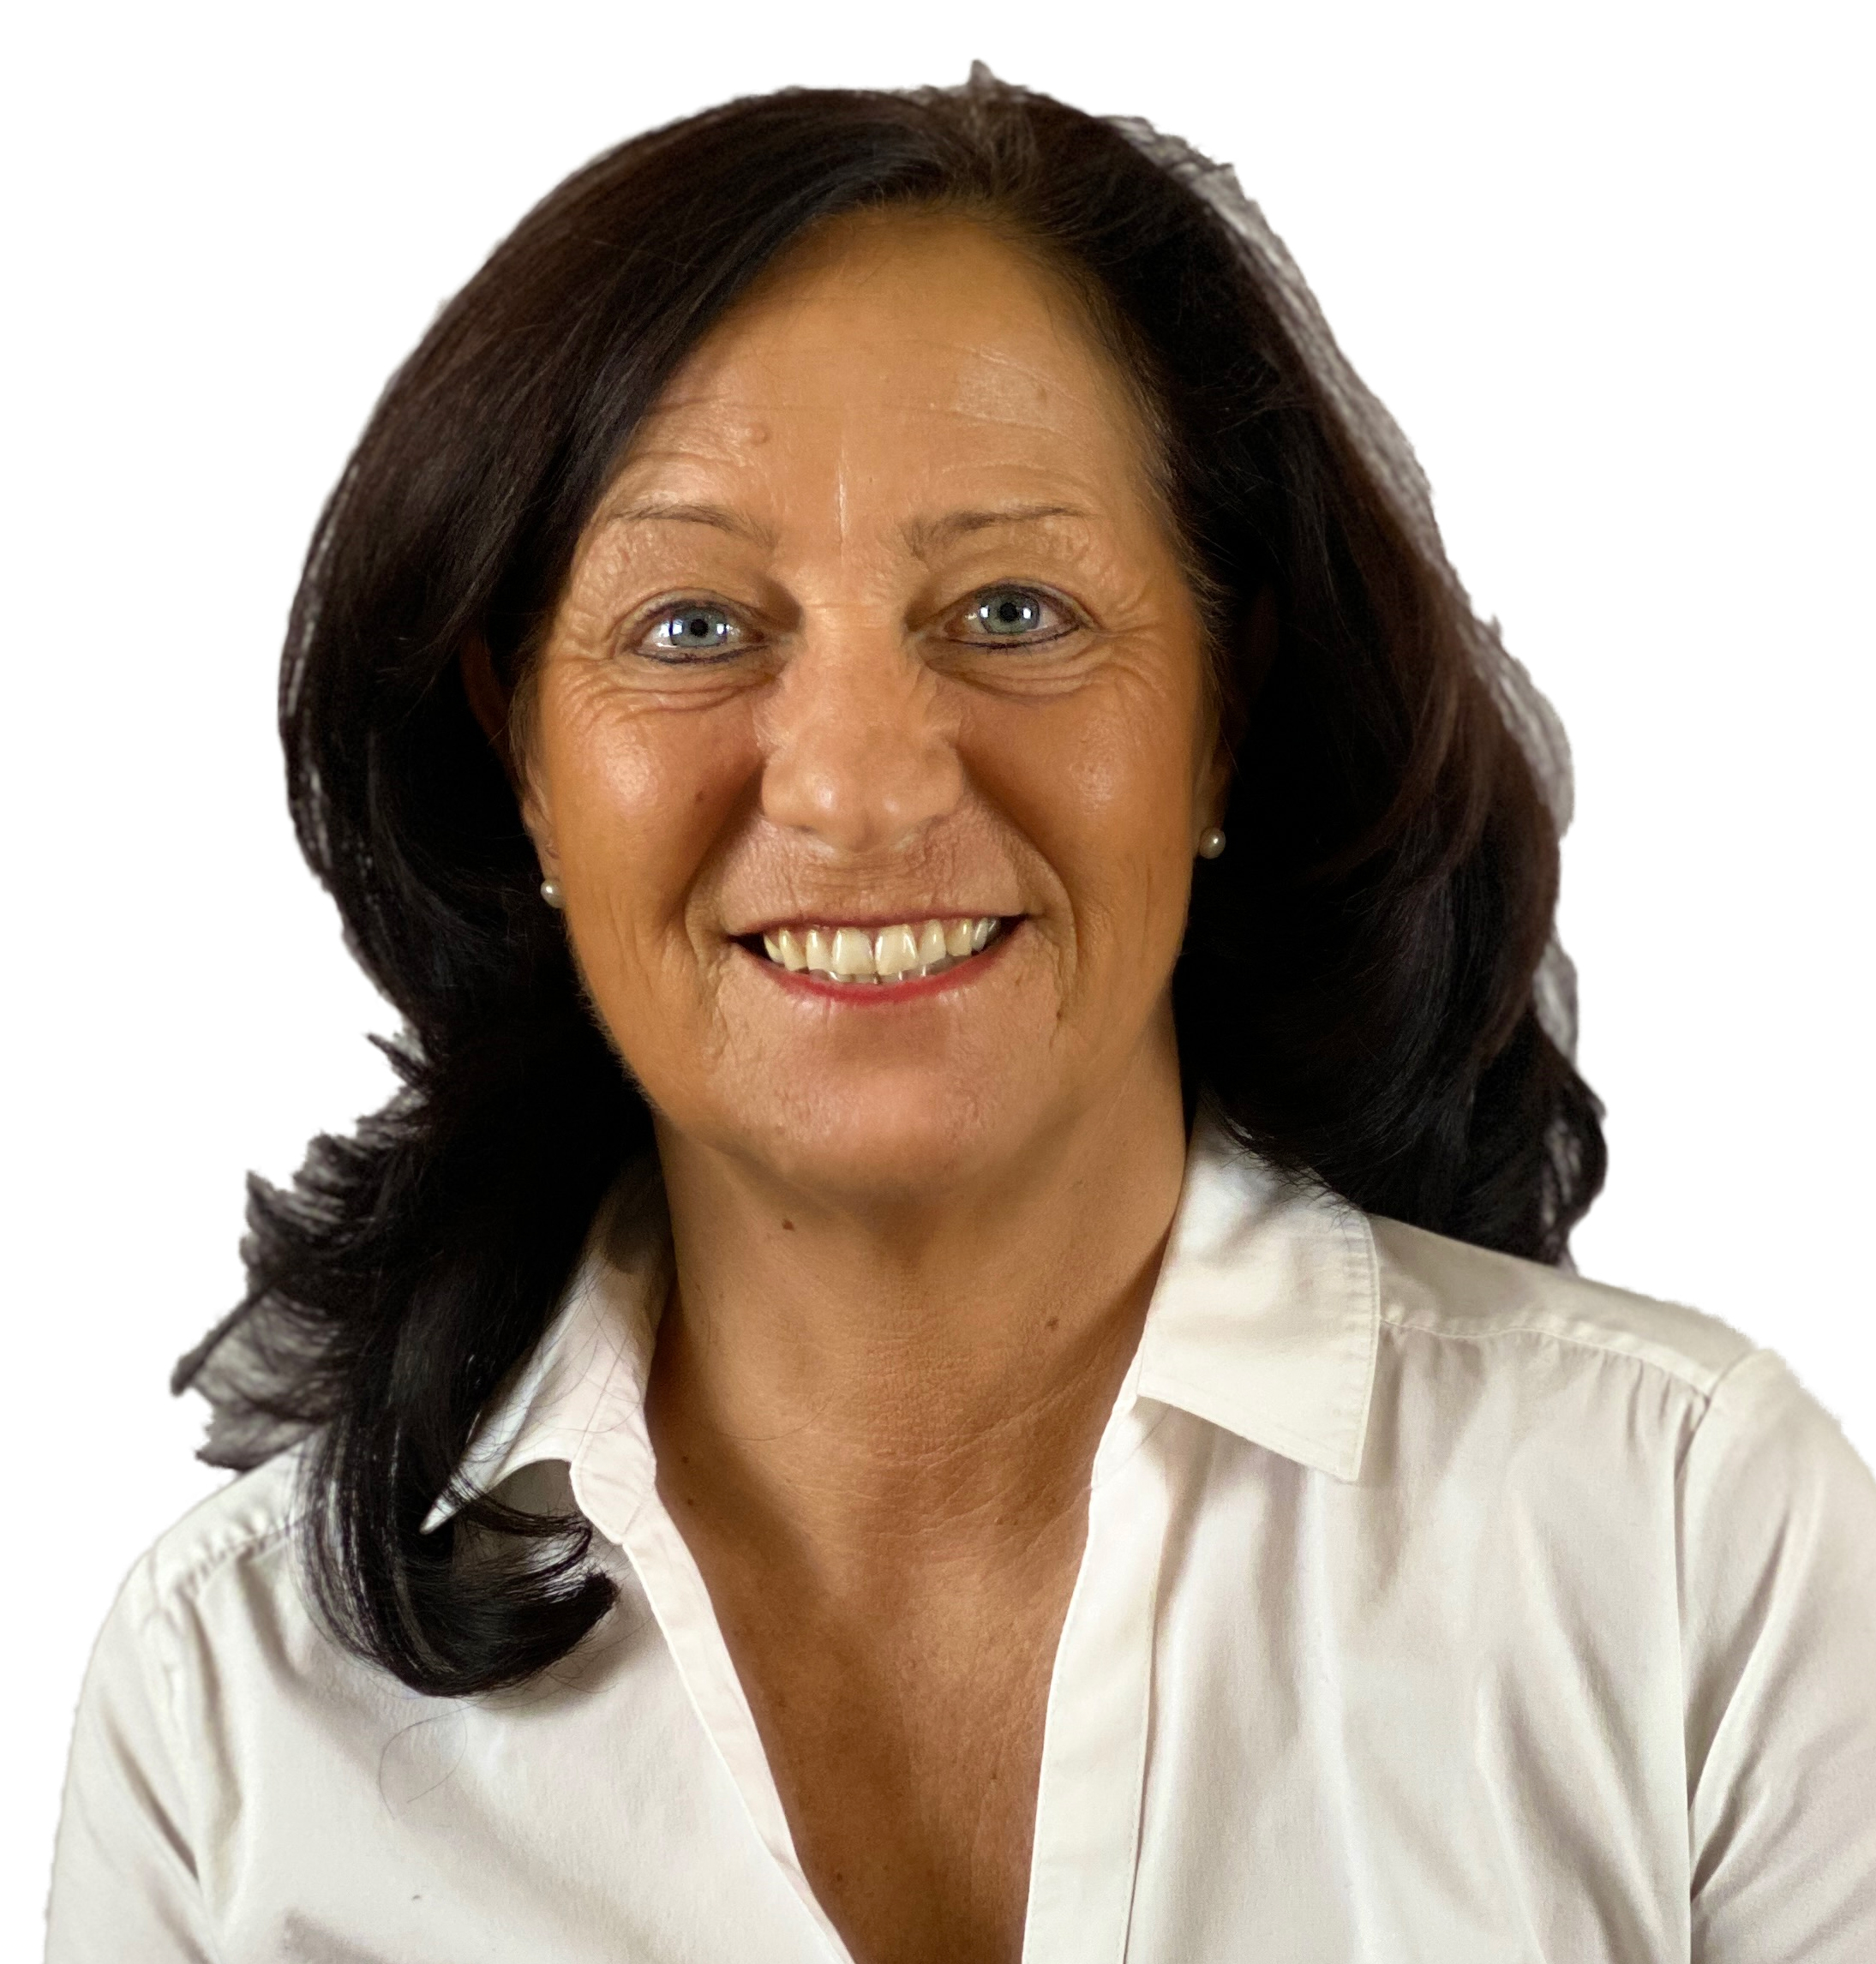 Martina Rapprich